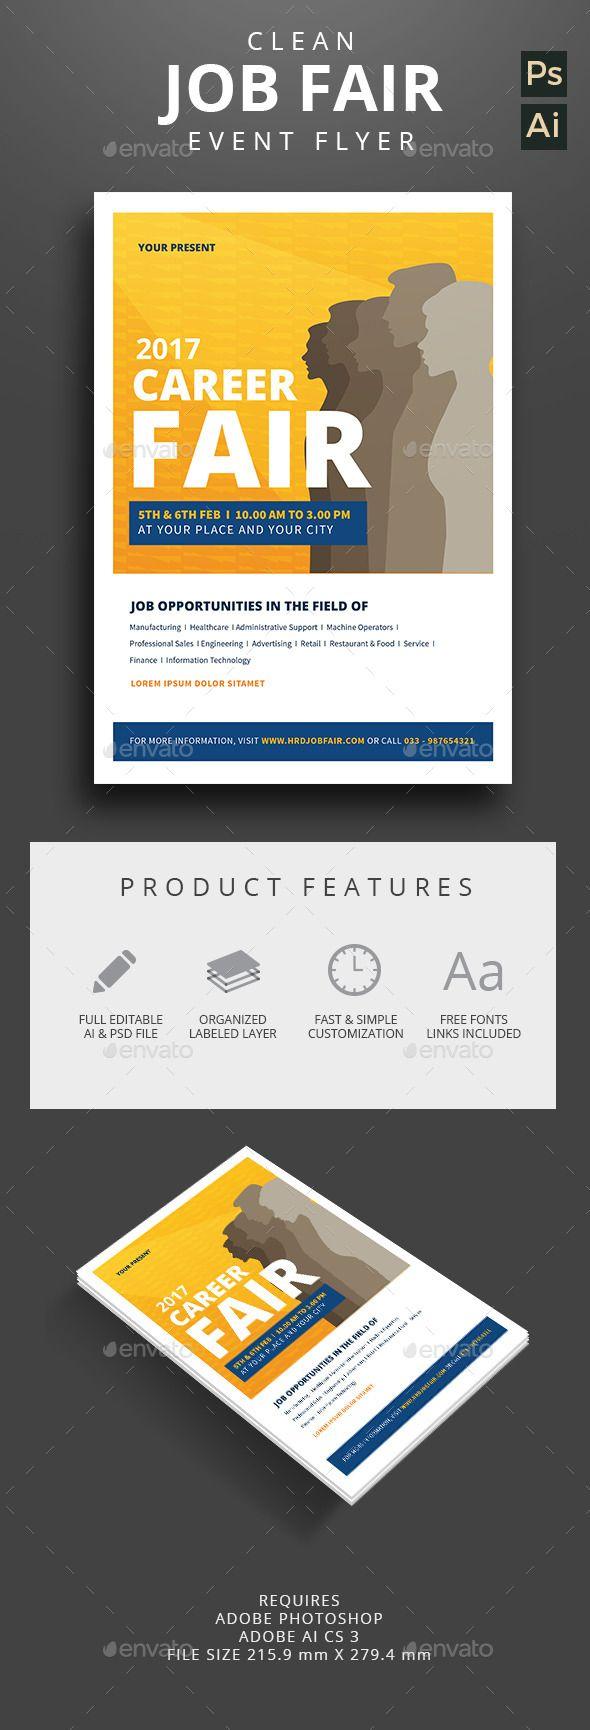 top ideas about job fair interview nails job clean job fair event flyer